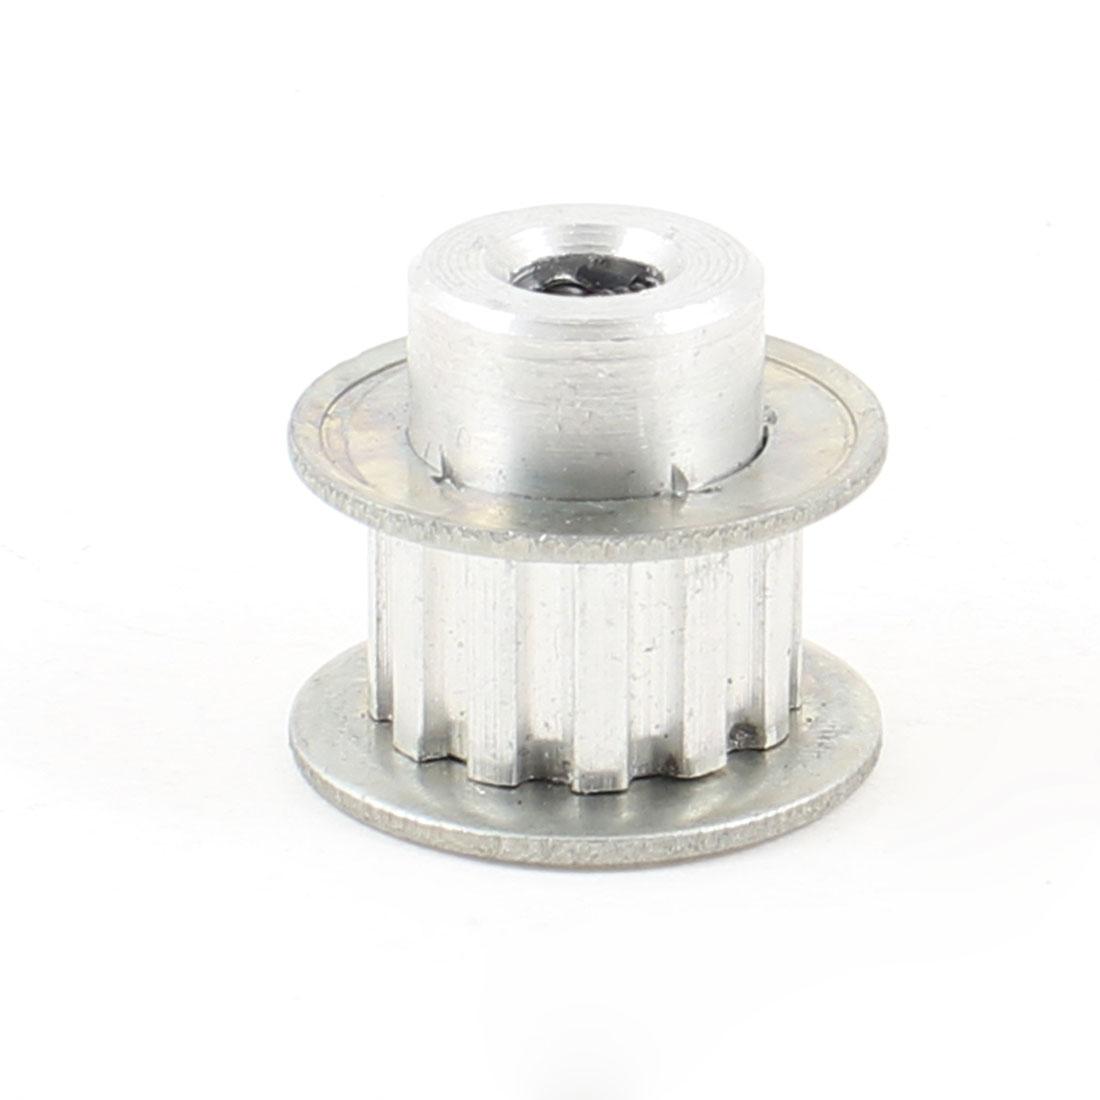 Silver Tone Aluminum Alloy 12 Teeth 6.35mm Pilot Bore Screwed Timing Pulley